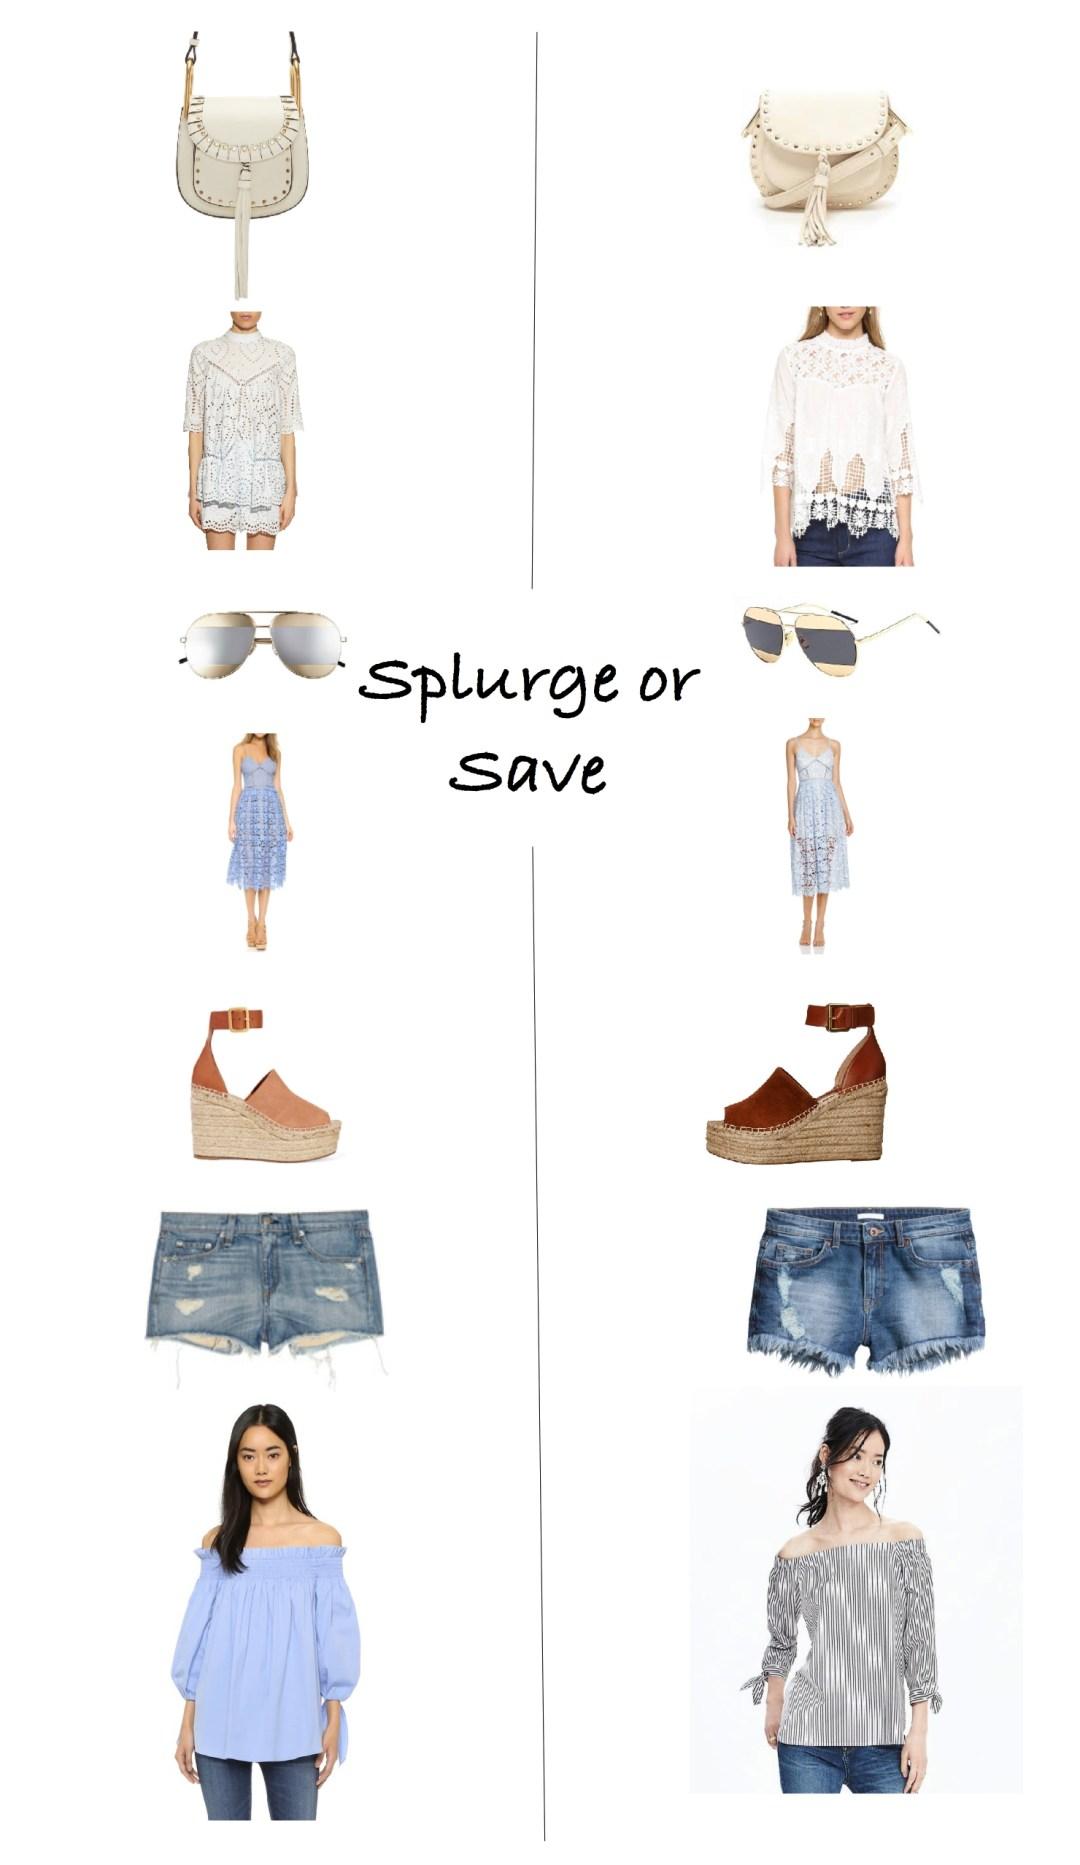 Spring 2016 splurge or save